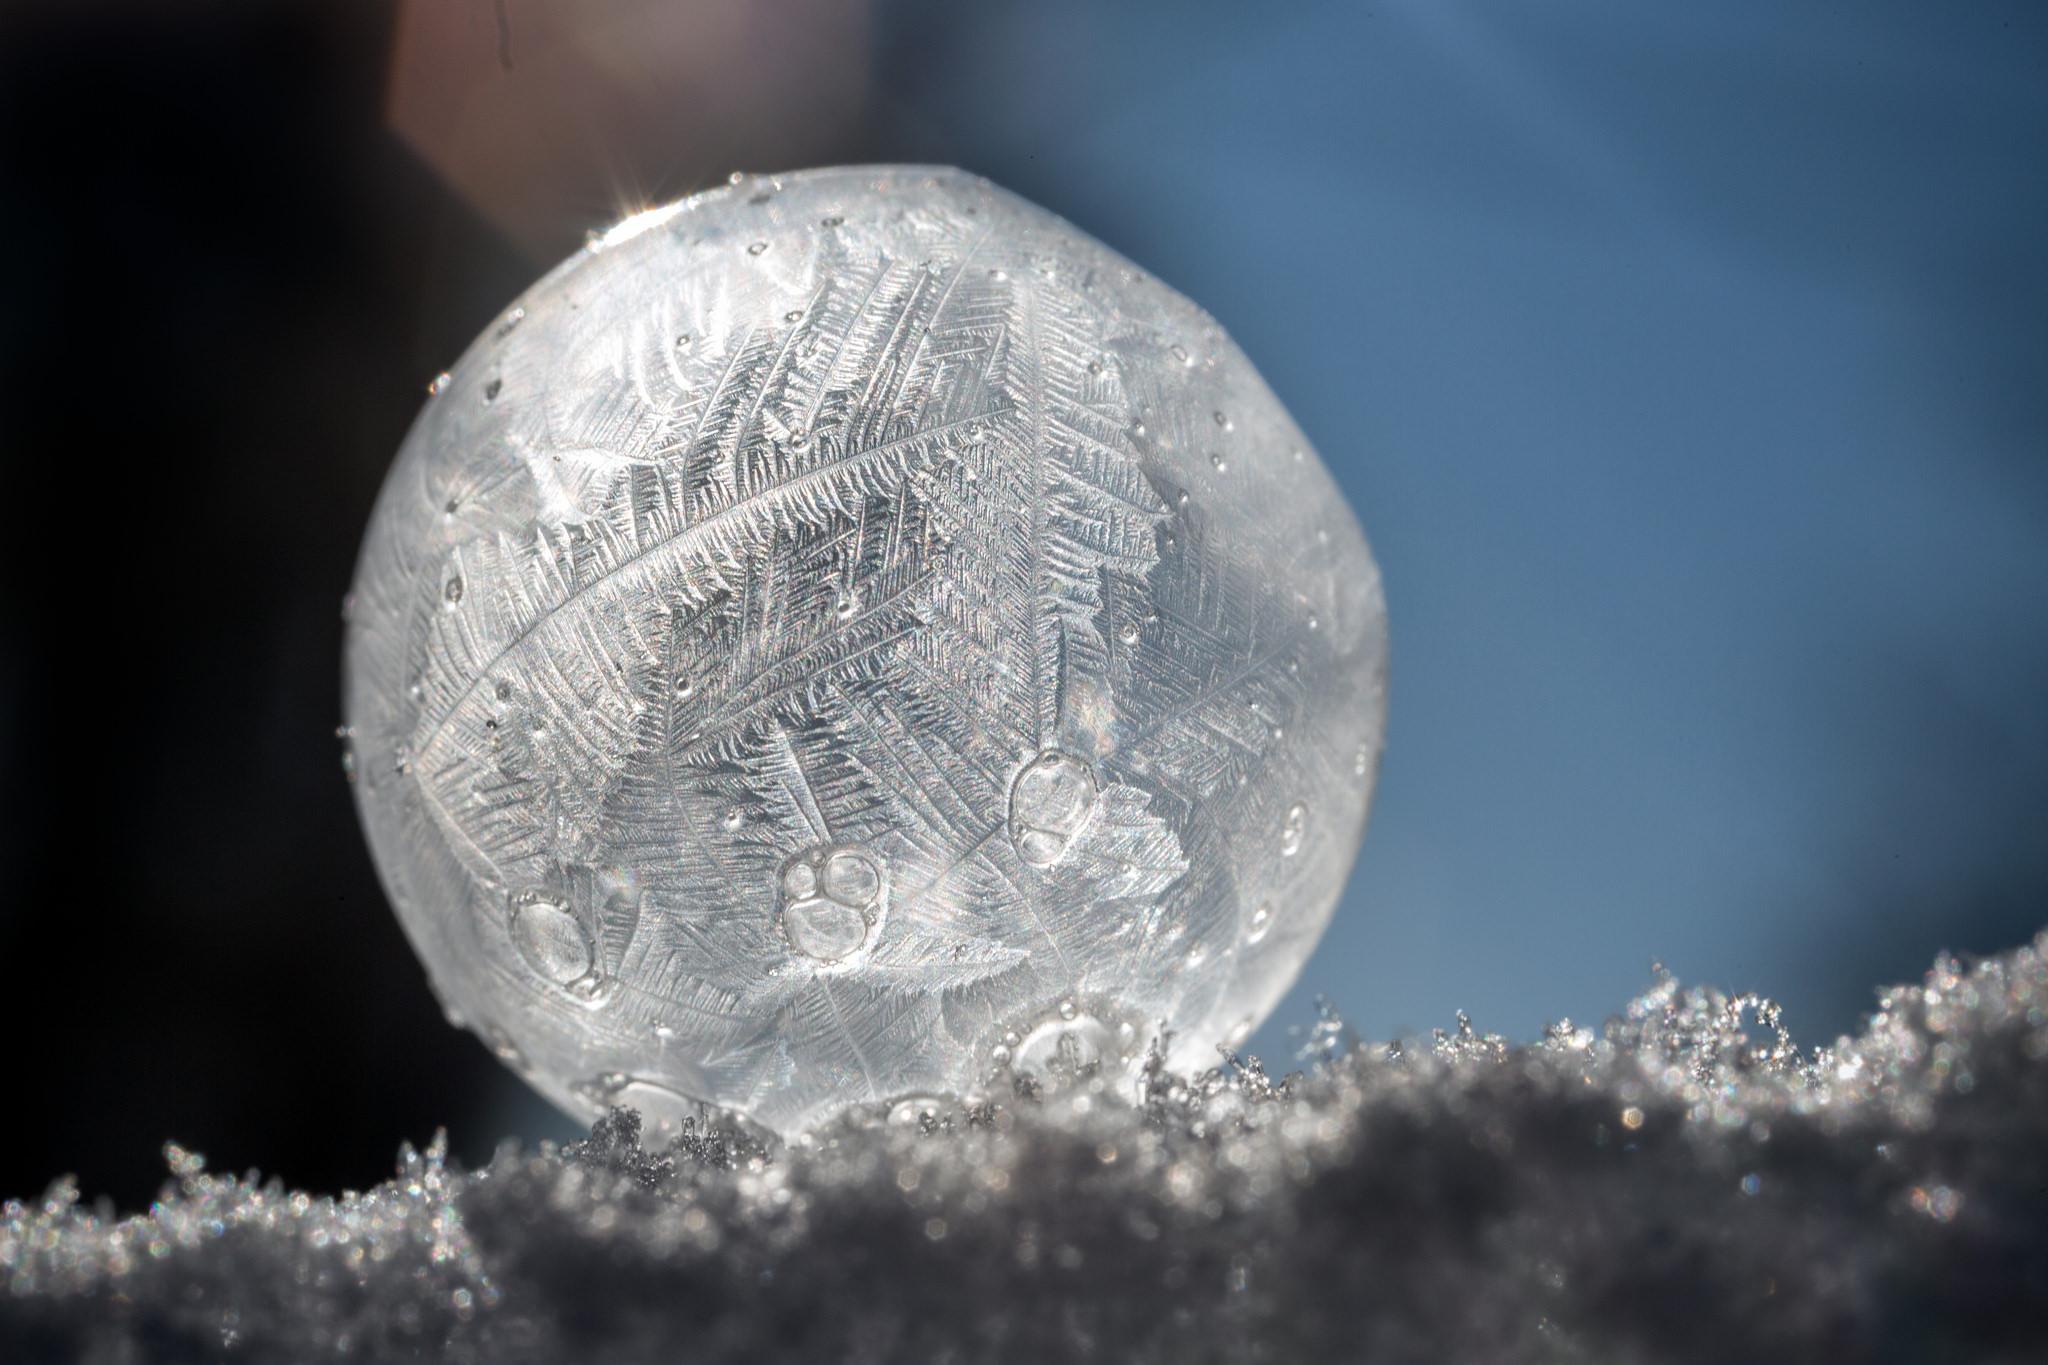 Frozen soap bubble in the snow, Park Rapids MN (-18 degrees)